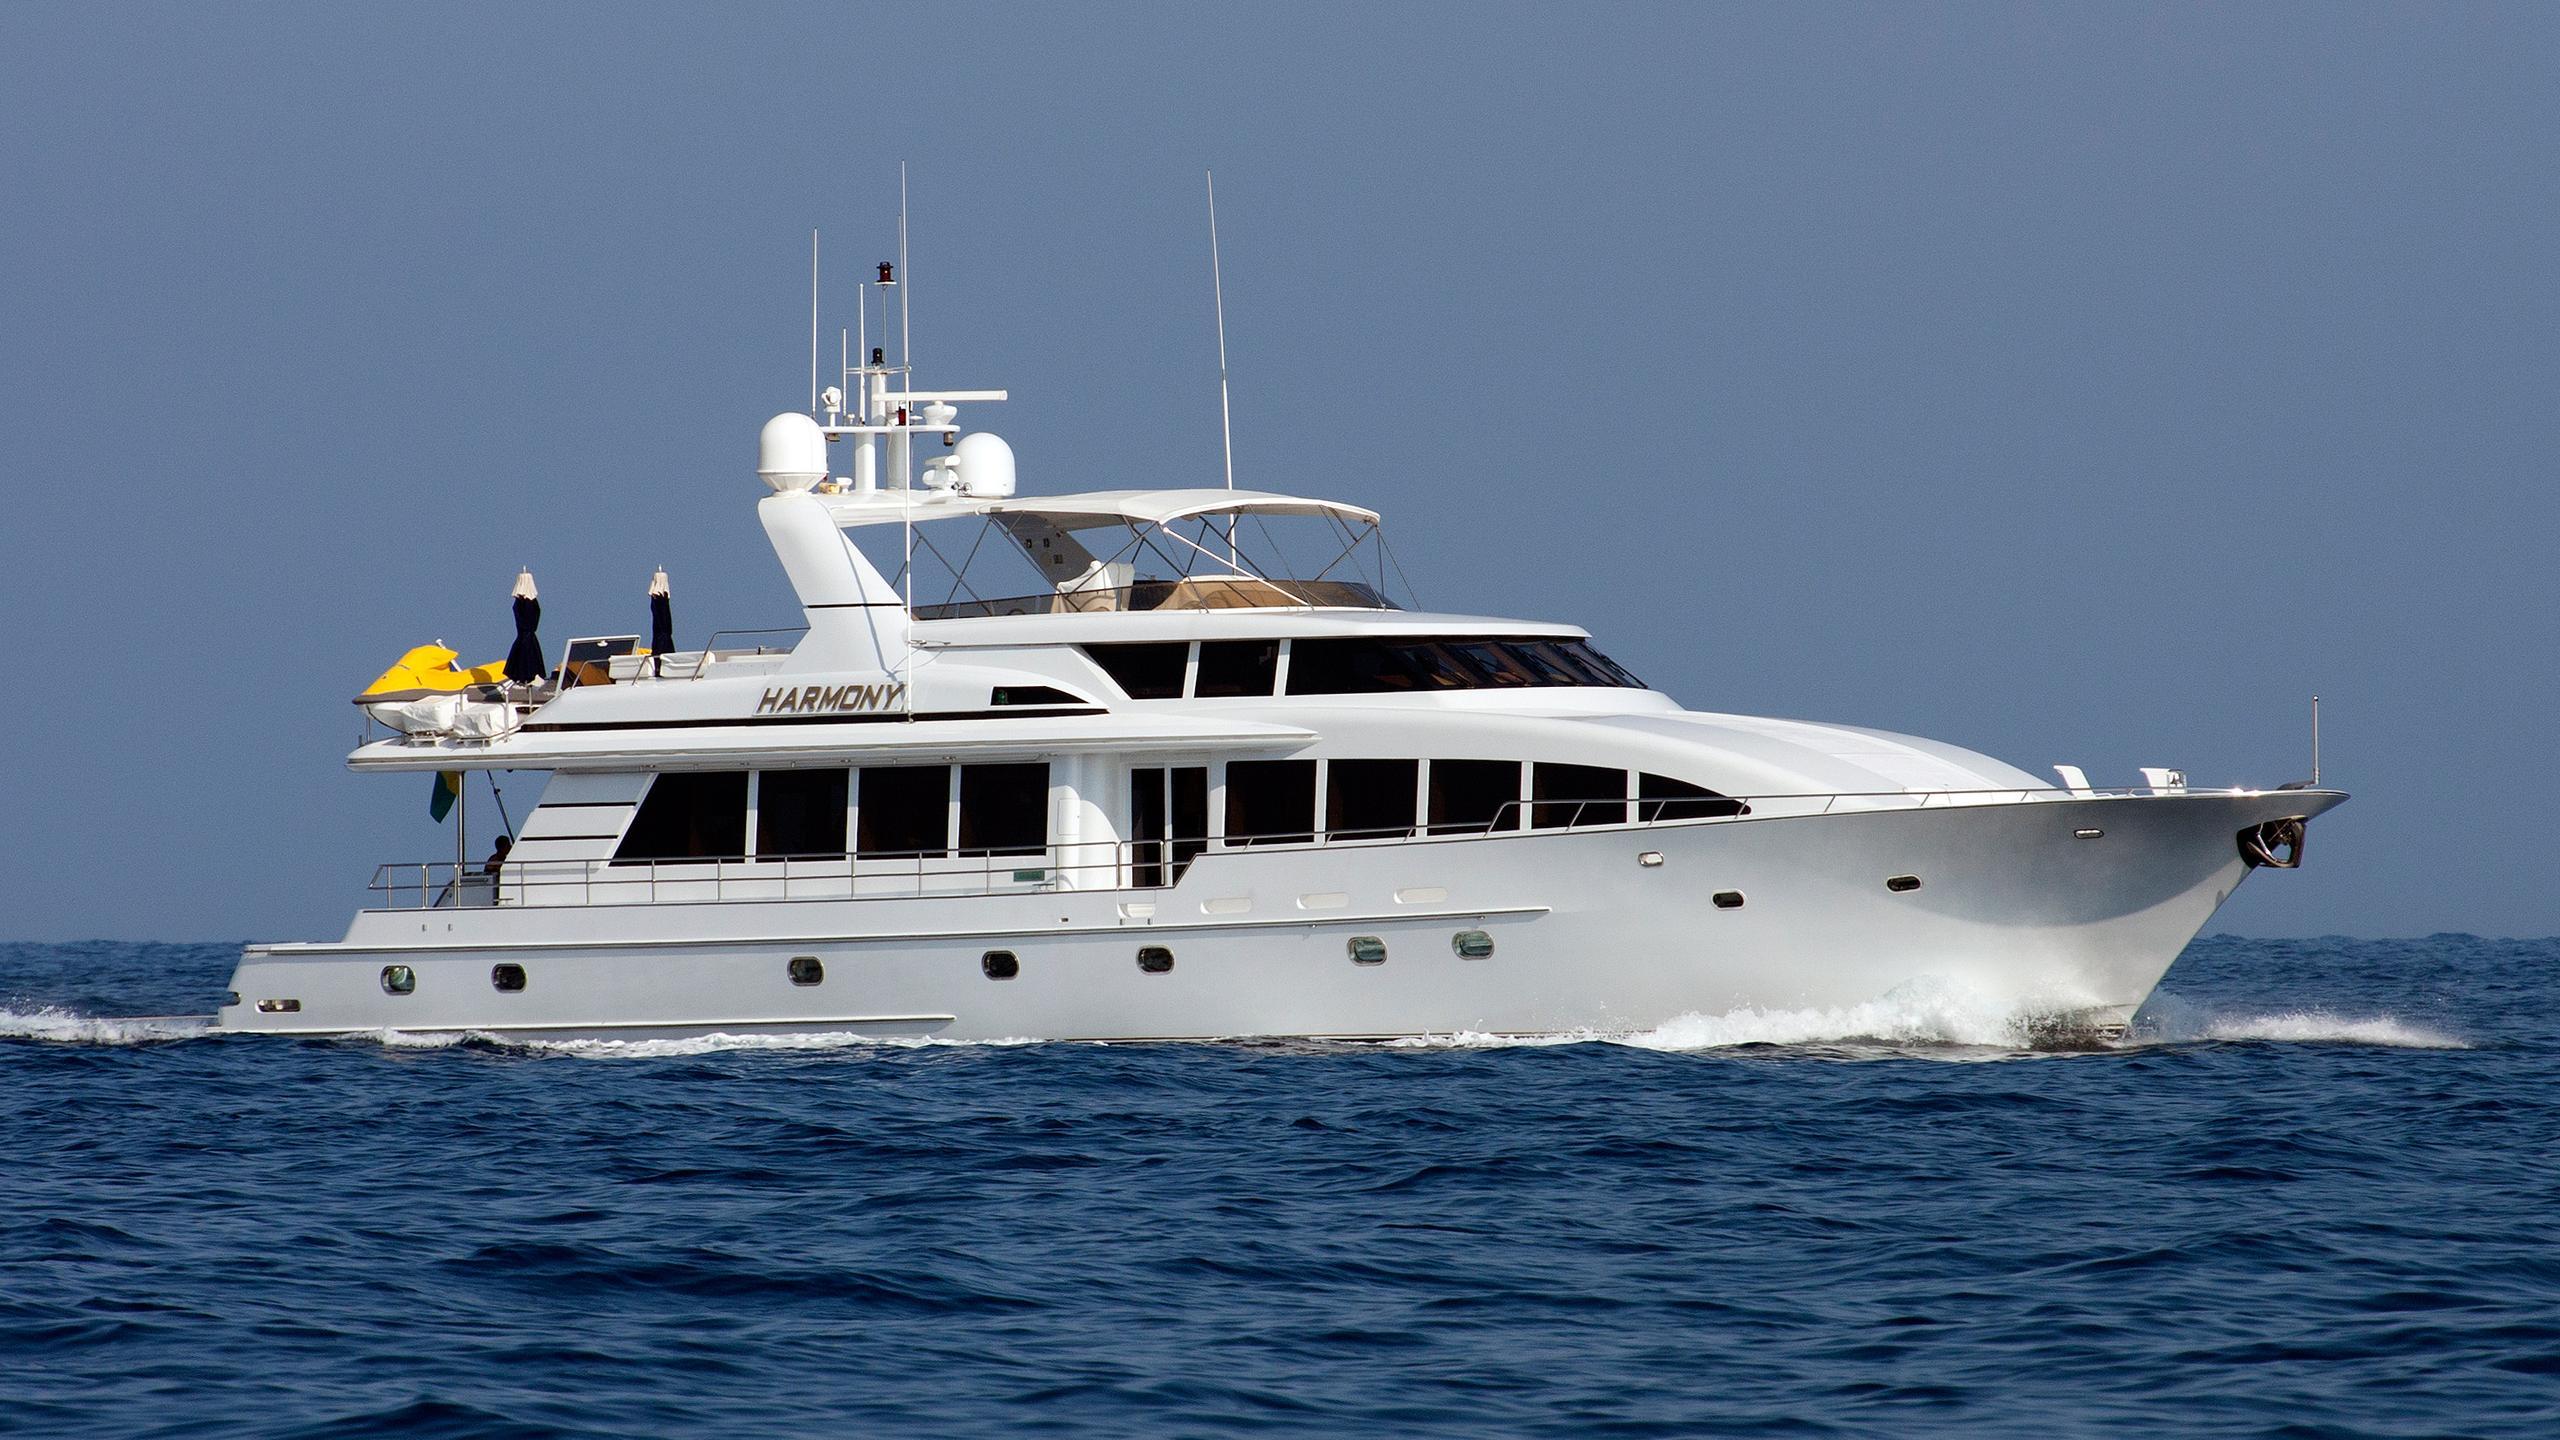 harmony-motor-yacht-crescent-custom-1999-35m-cruising